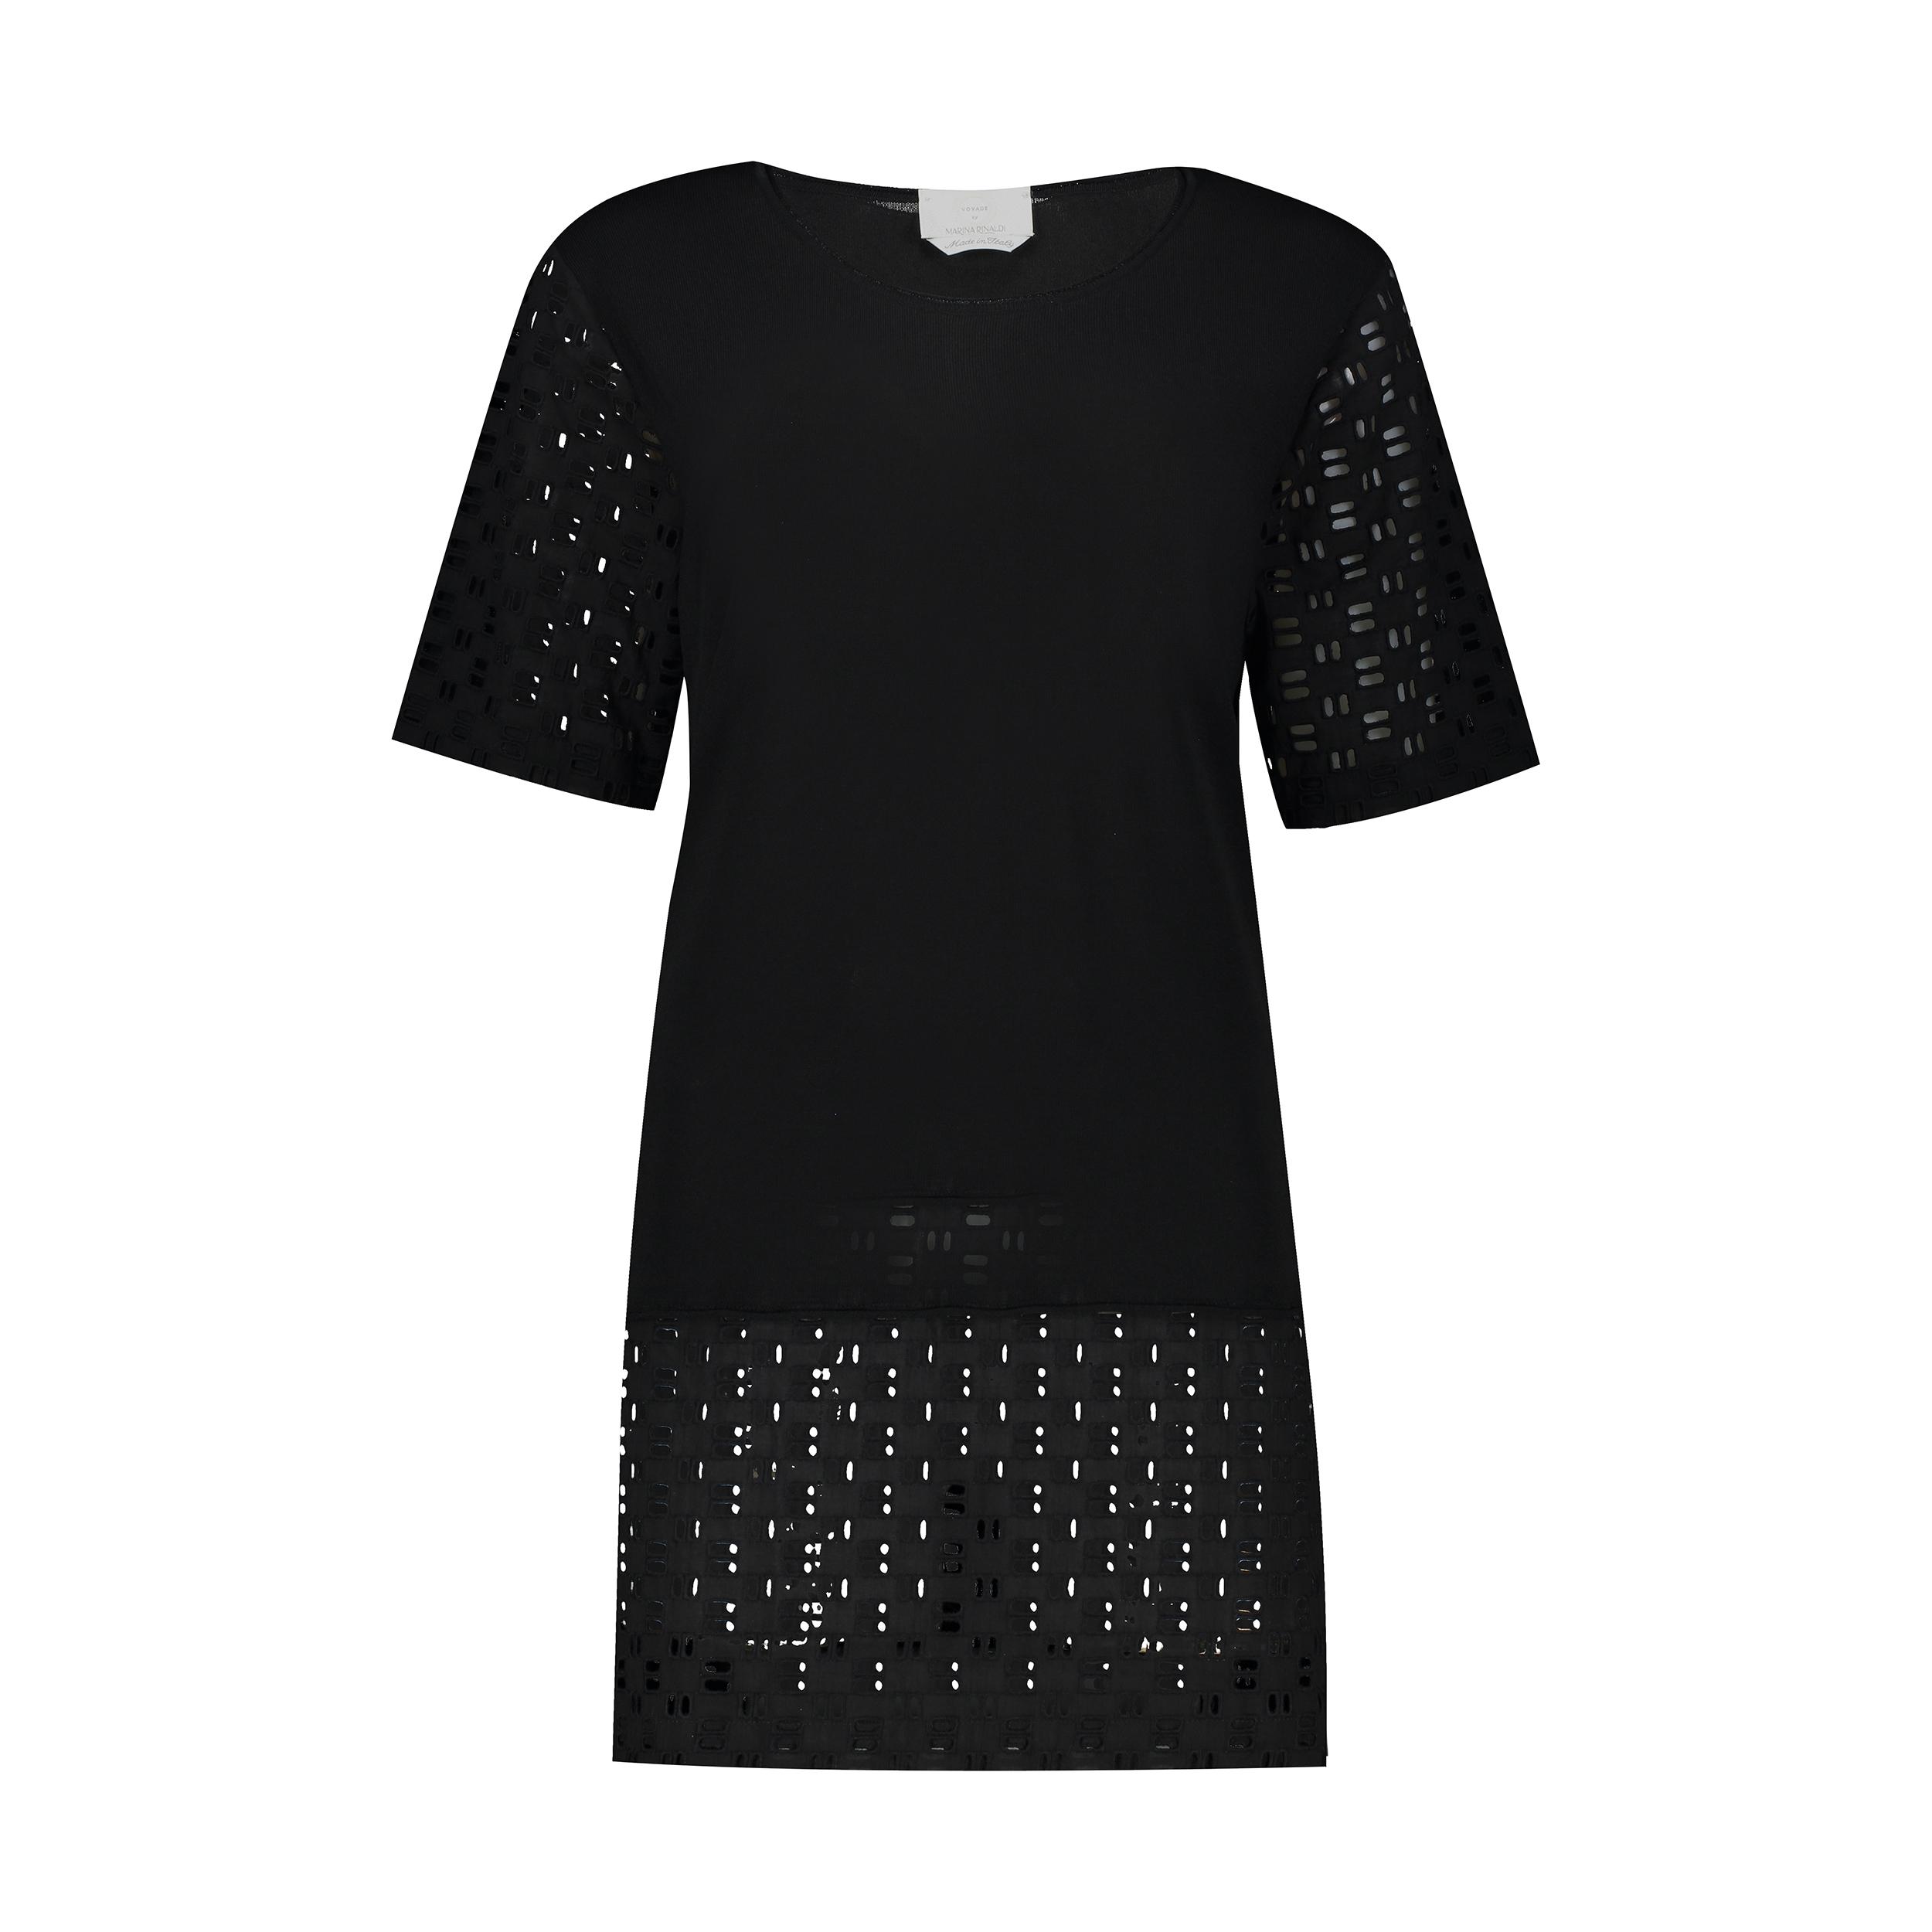 پیراهن زنانه مارینا رینالدی مدل 33621260040803